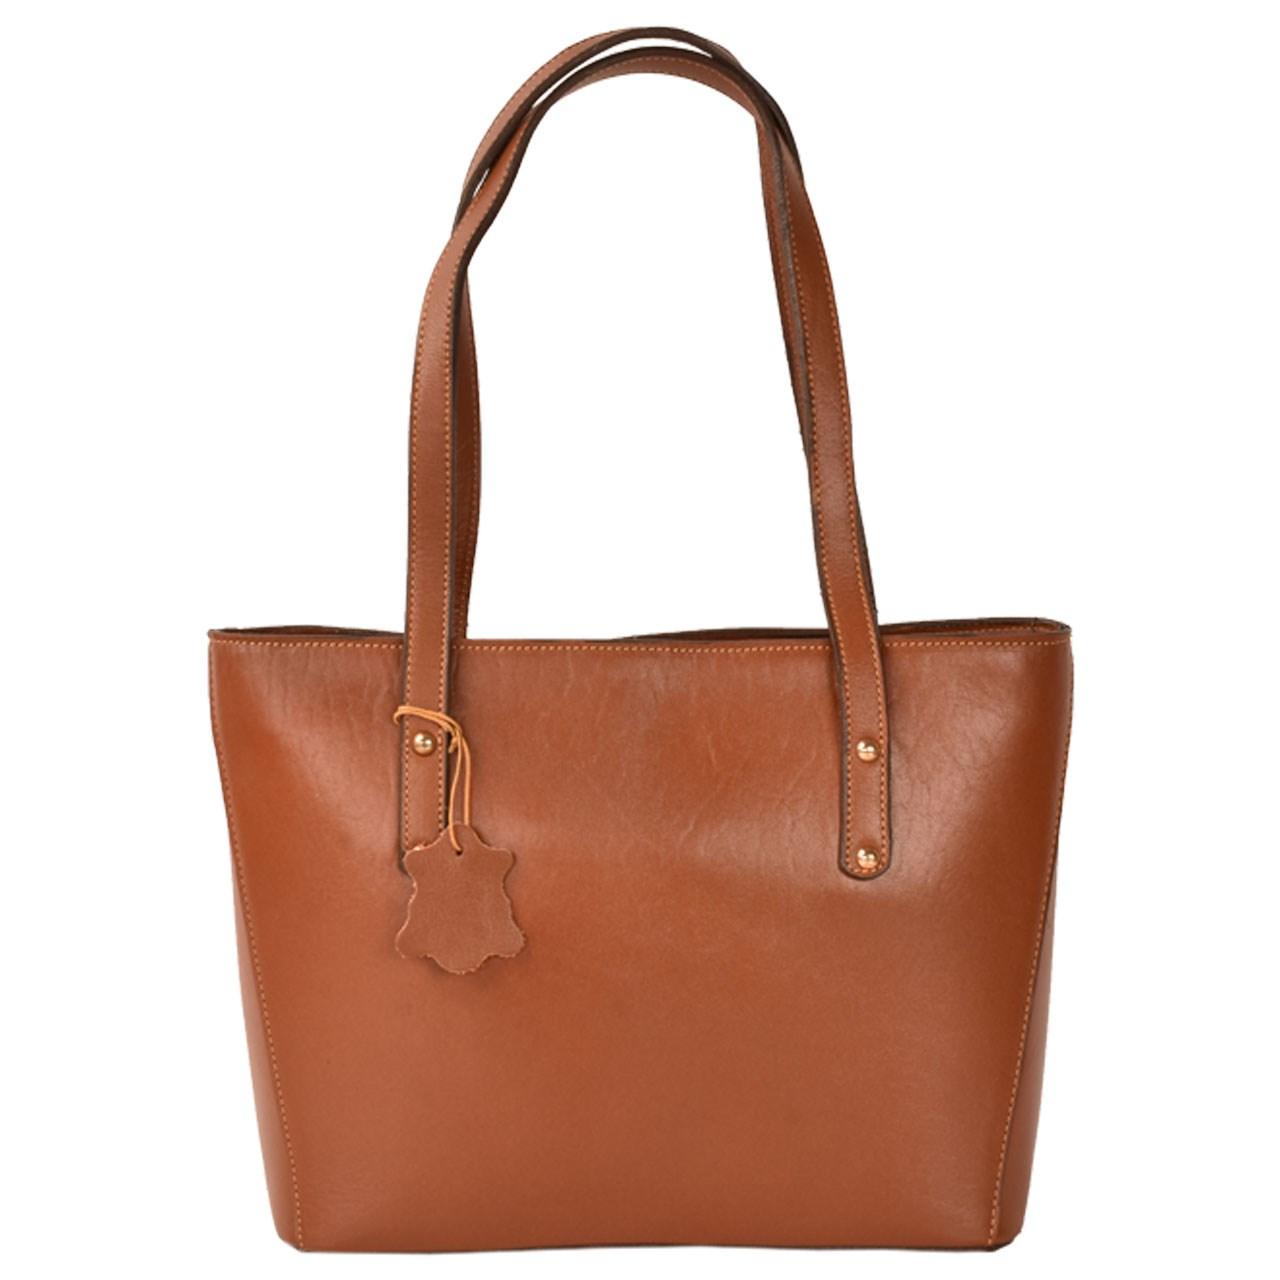 کیف دستی چرم طبیعی کهن چرم مدل V166-1